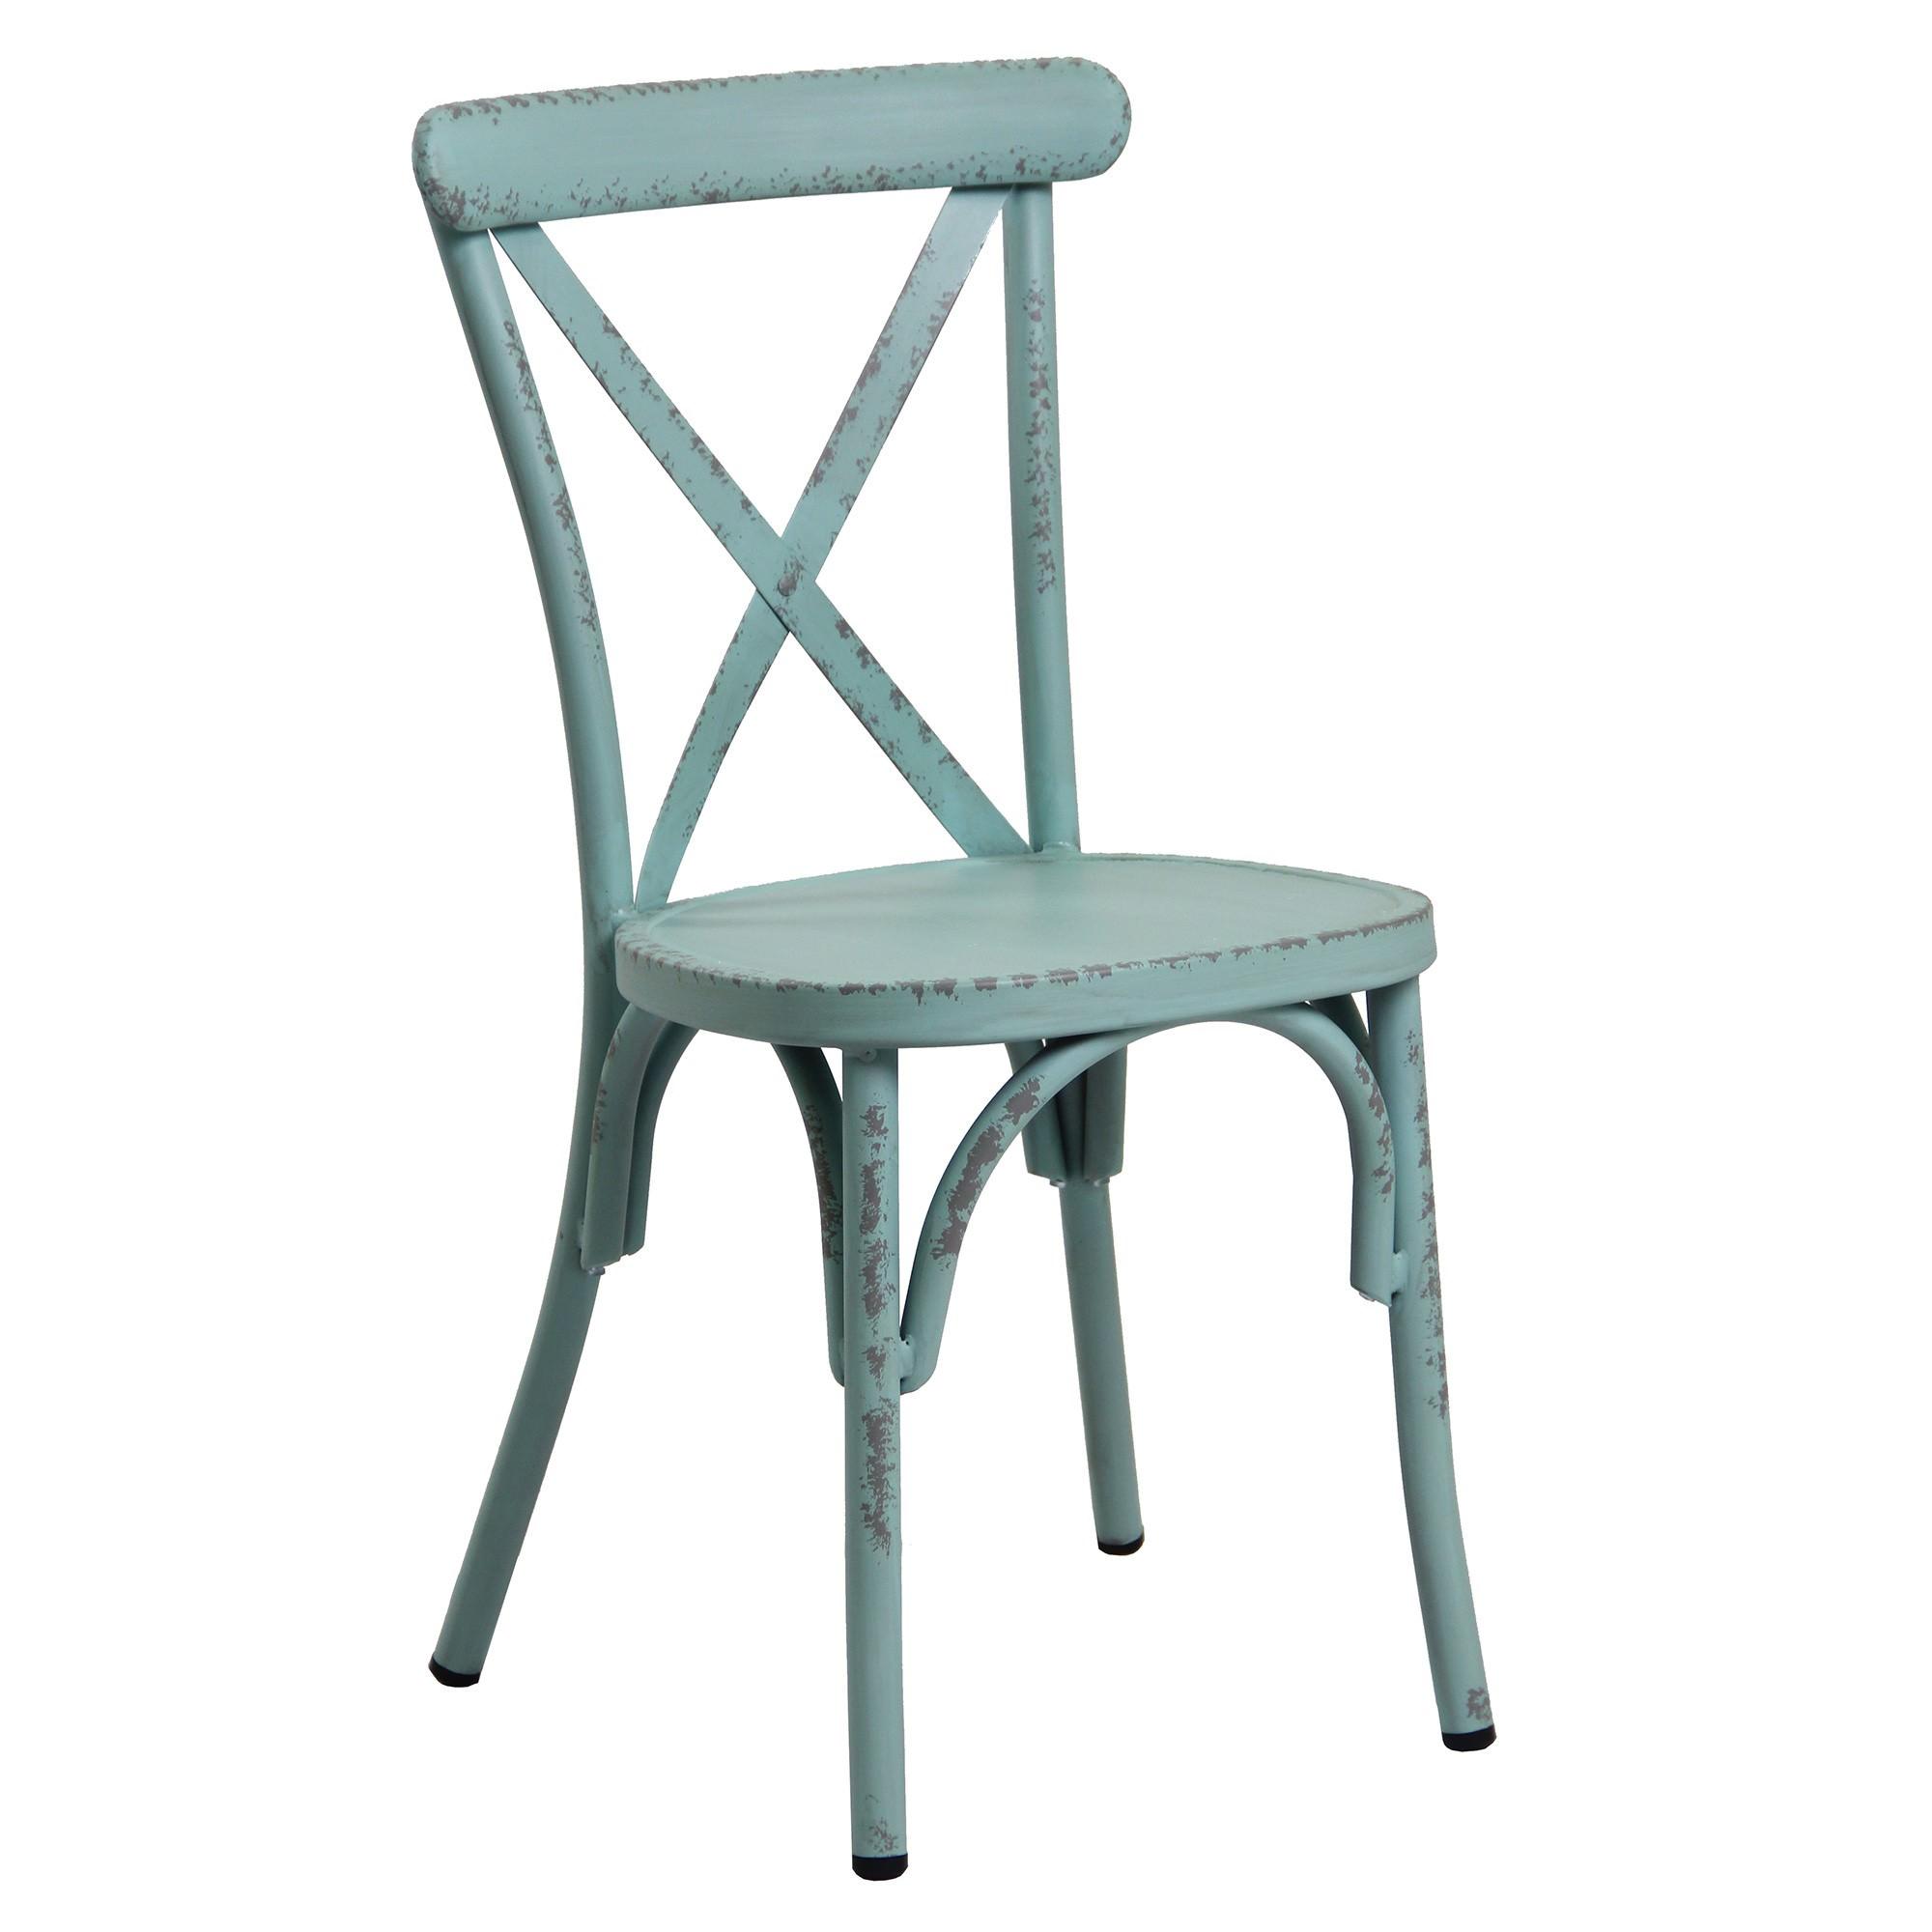 Set of 2 Ochey Commercial Grade Aluminium Indoor / Outdoor Cross Back Dining Chairs, Distressed Duck Egg Blue